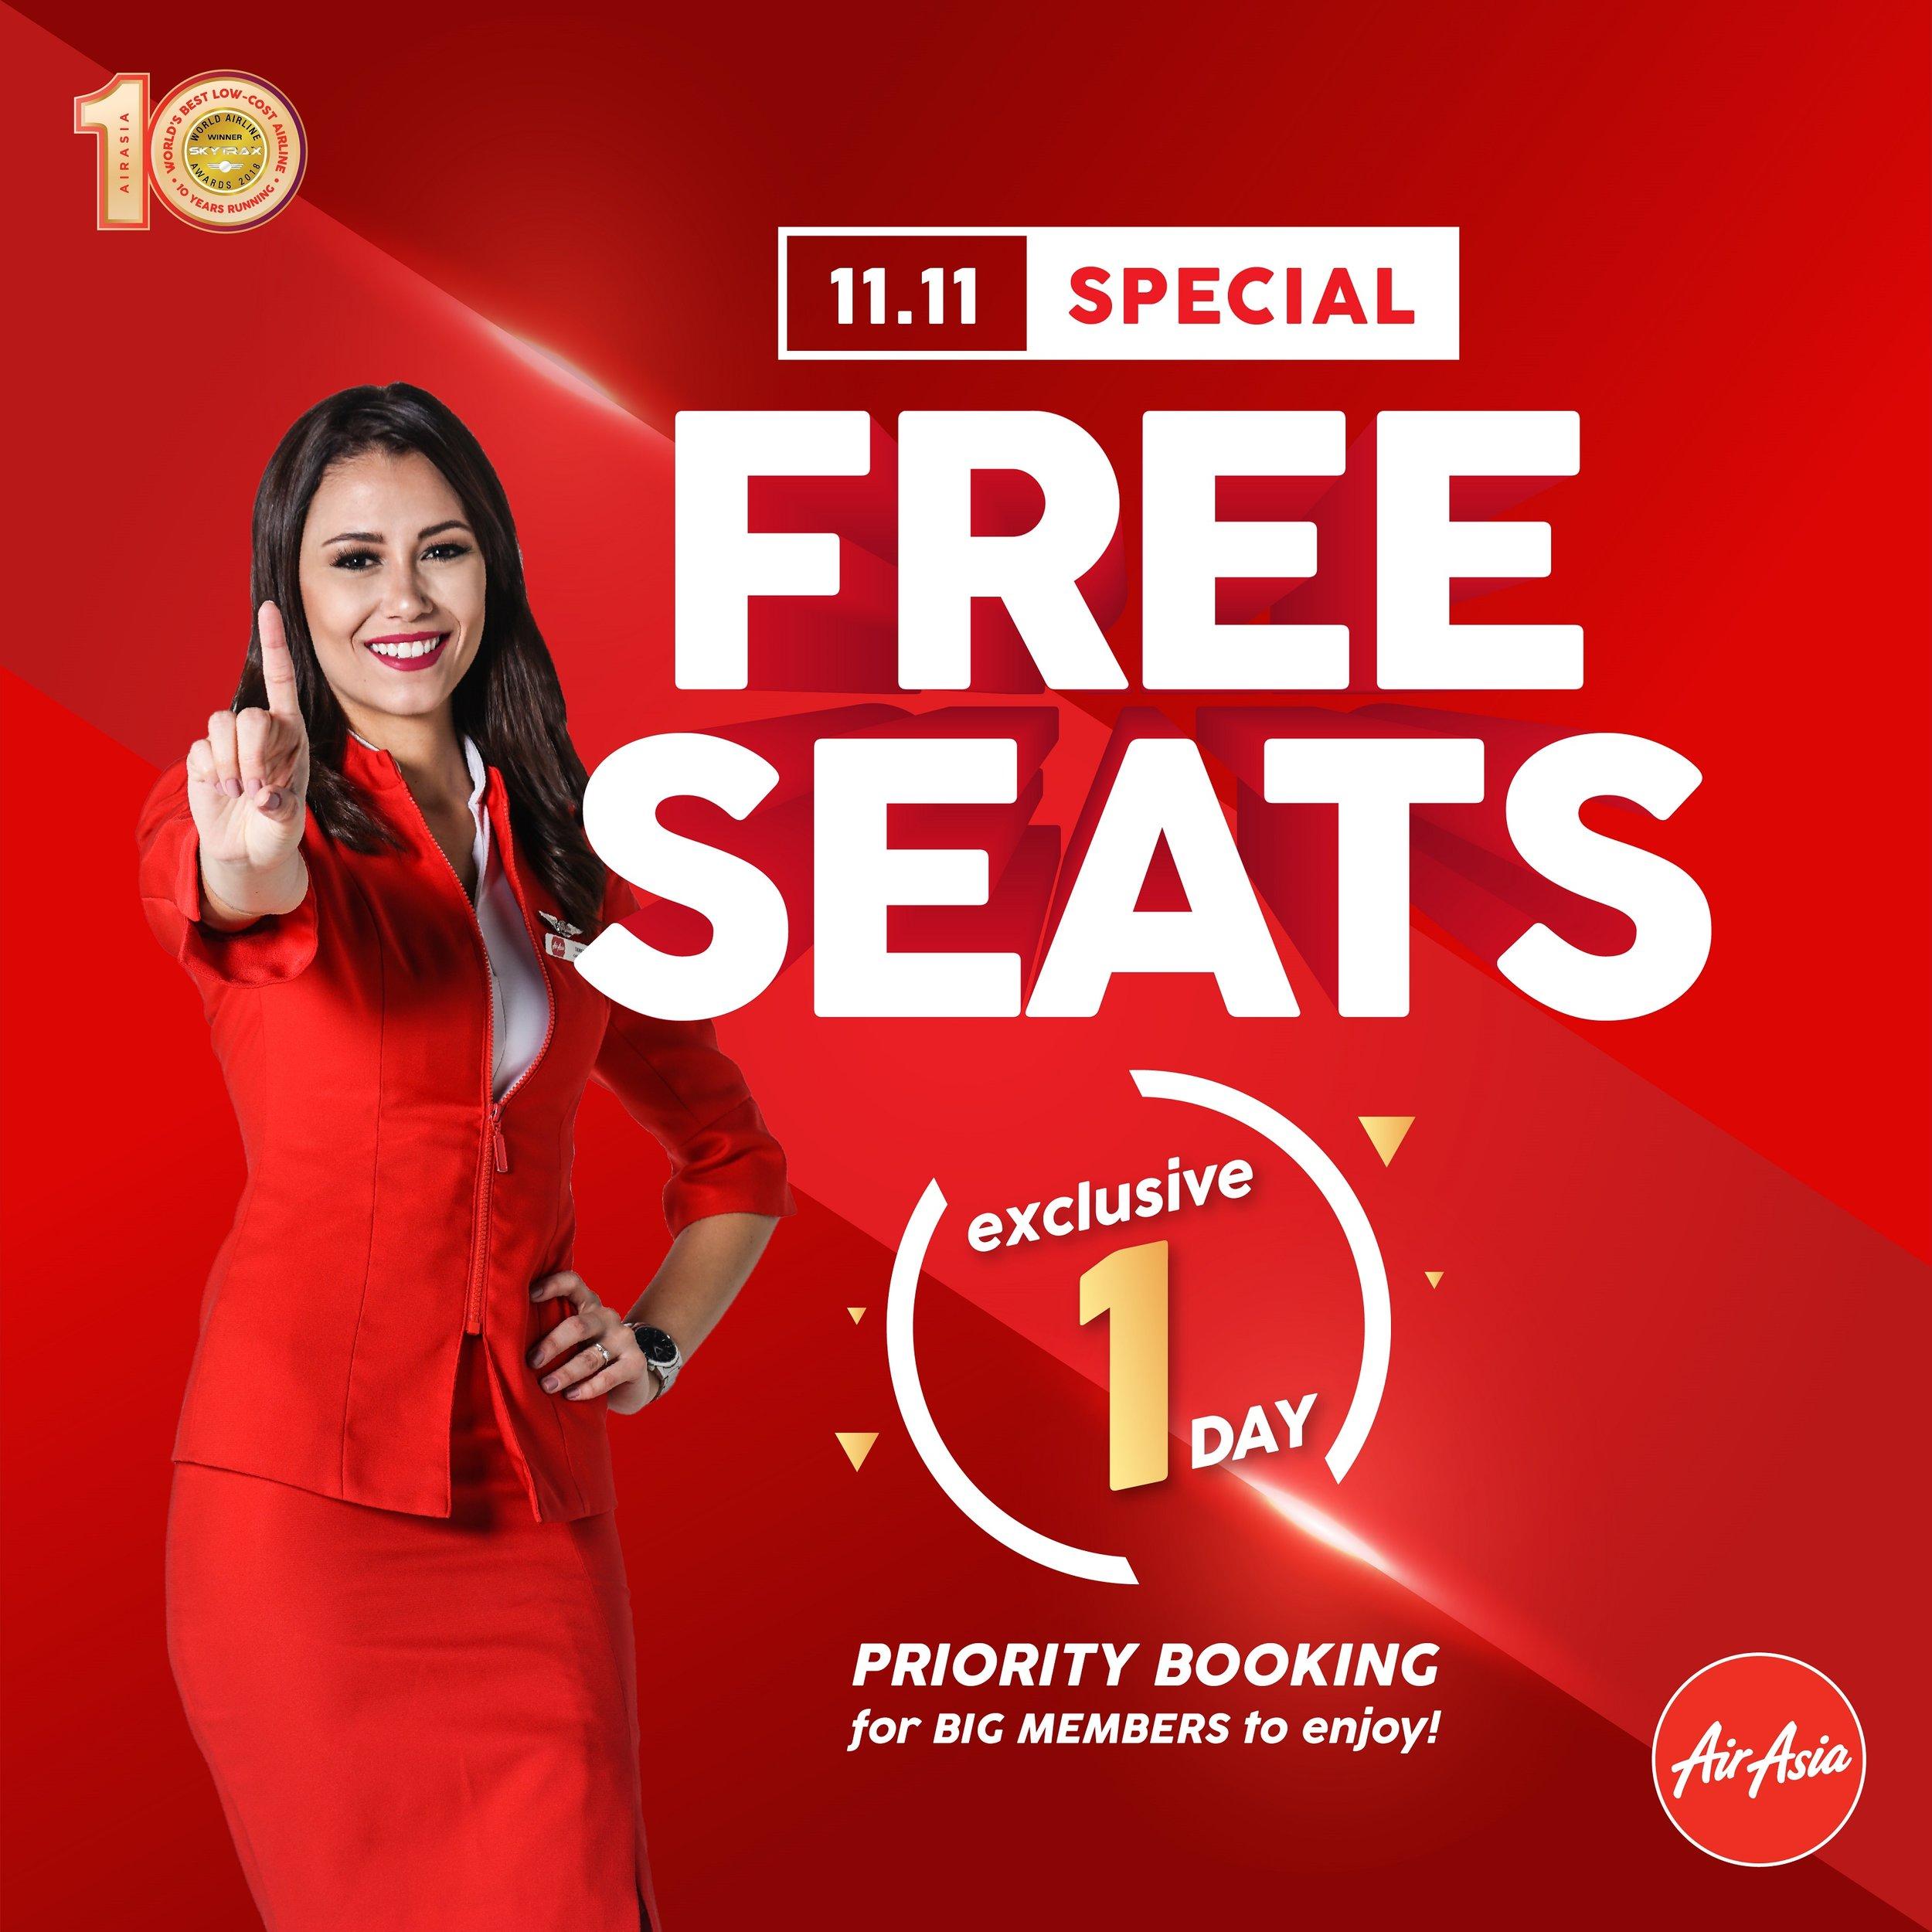 AirAsia Free Seats - November 2018.jpg